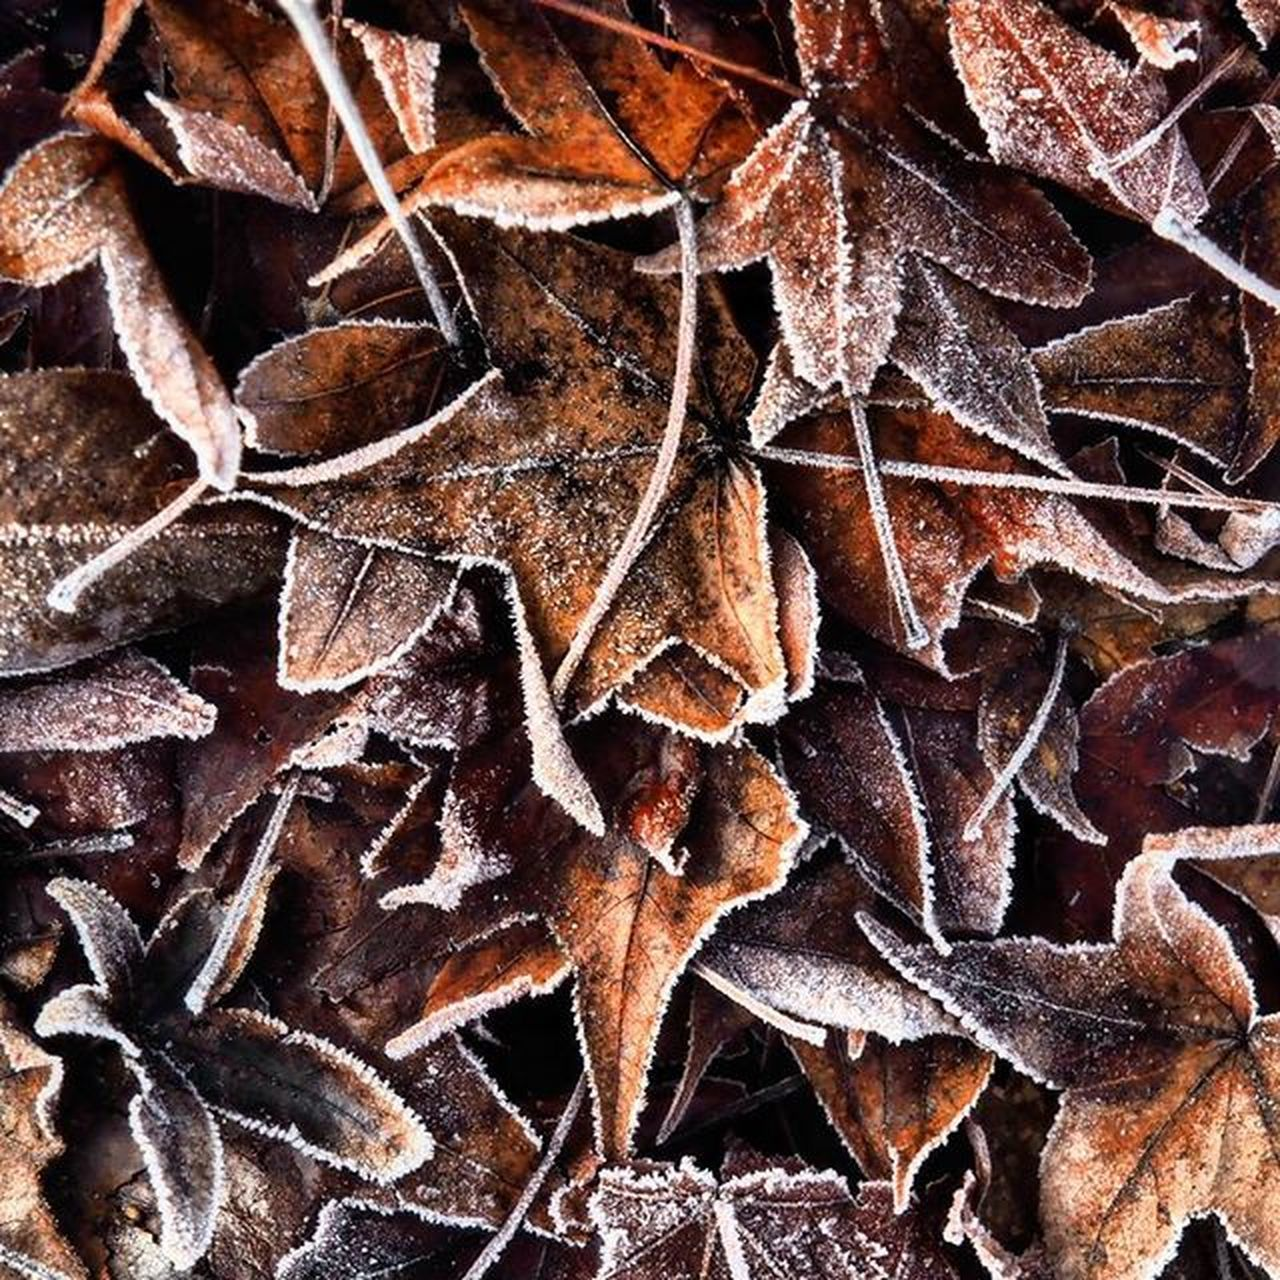 On the first day of the year, Frost on the fallen Leaves in Roseburg. Latergram Getolympus Olympusomdem1 Omdem1 Zuikodigital Pacificnorthwest Pacificnw PNW PNWonderland Pnwlife Iloveoregon TravelOregon Upperleftusa Nature Colorsofthenorthwest Frozen Optoutside